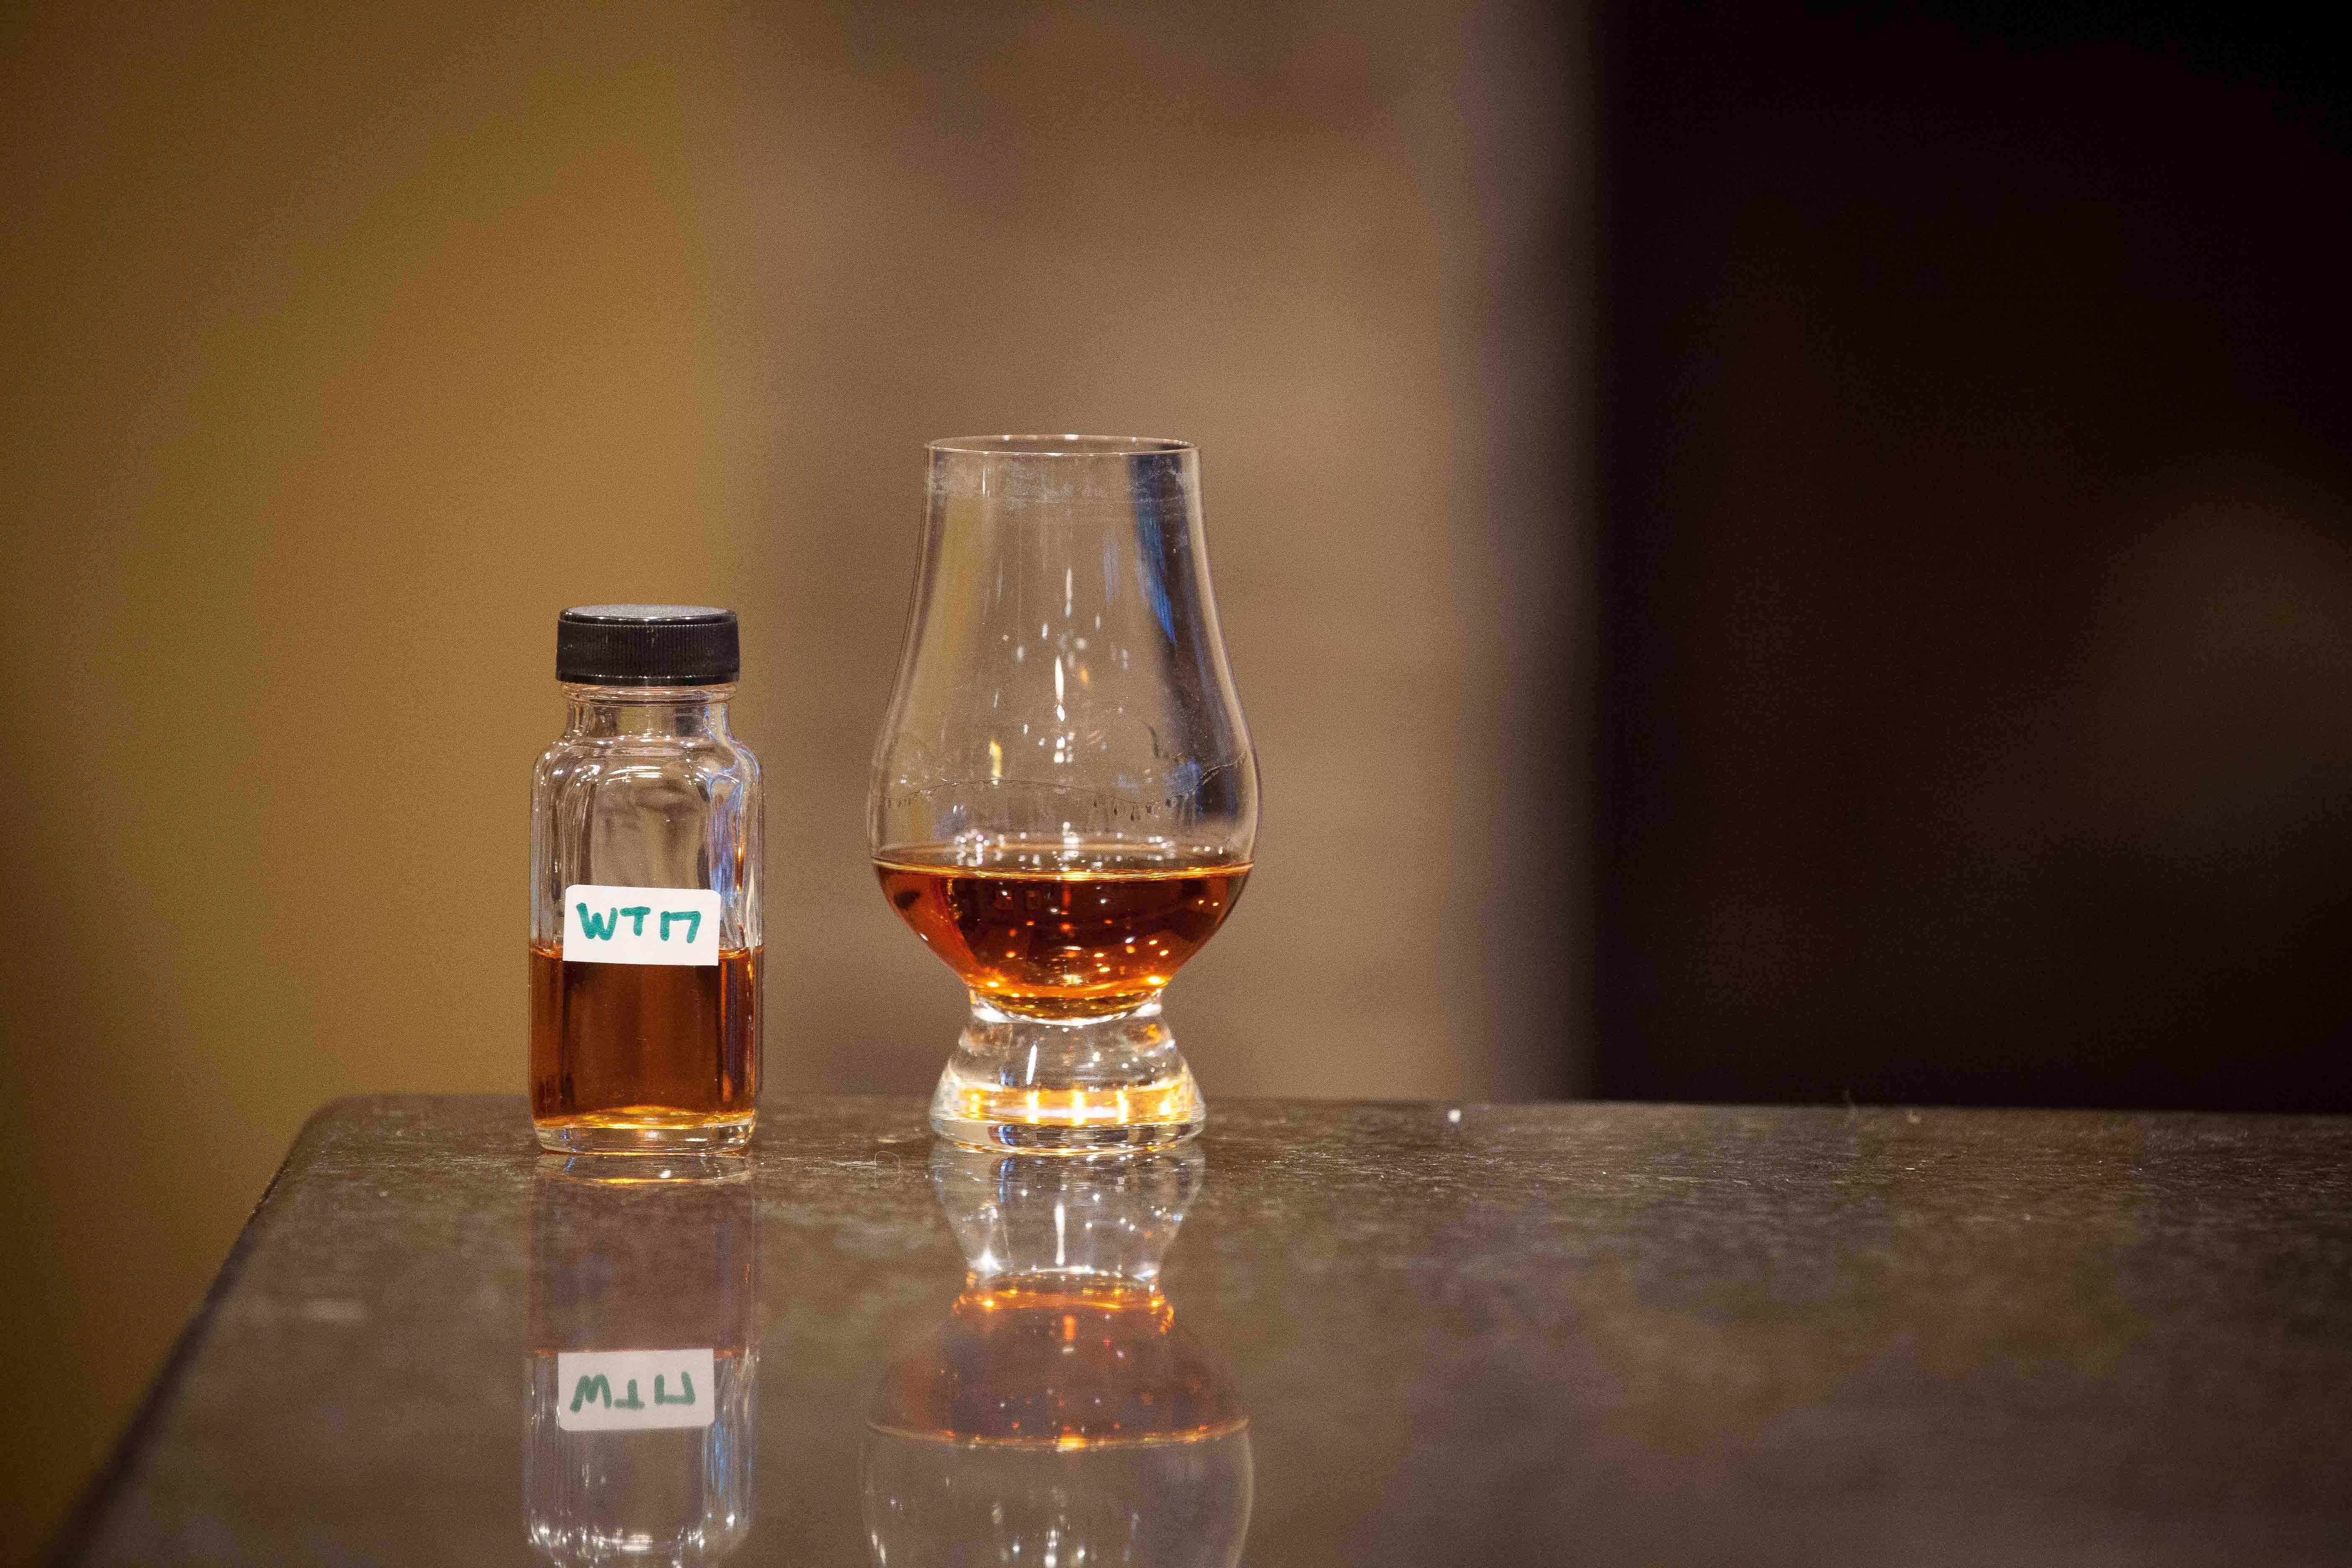 Review #178 - Wild Turkey 17 (Japan only release) #bourbon #whiskey #whisky #scotch #Kentucky #JimBeam #malt #pappy